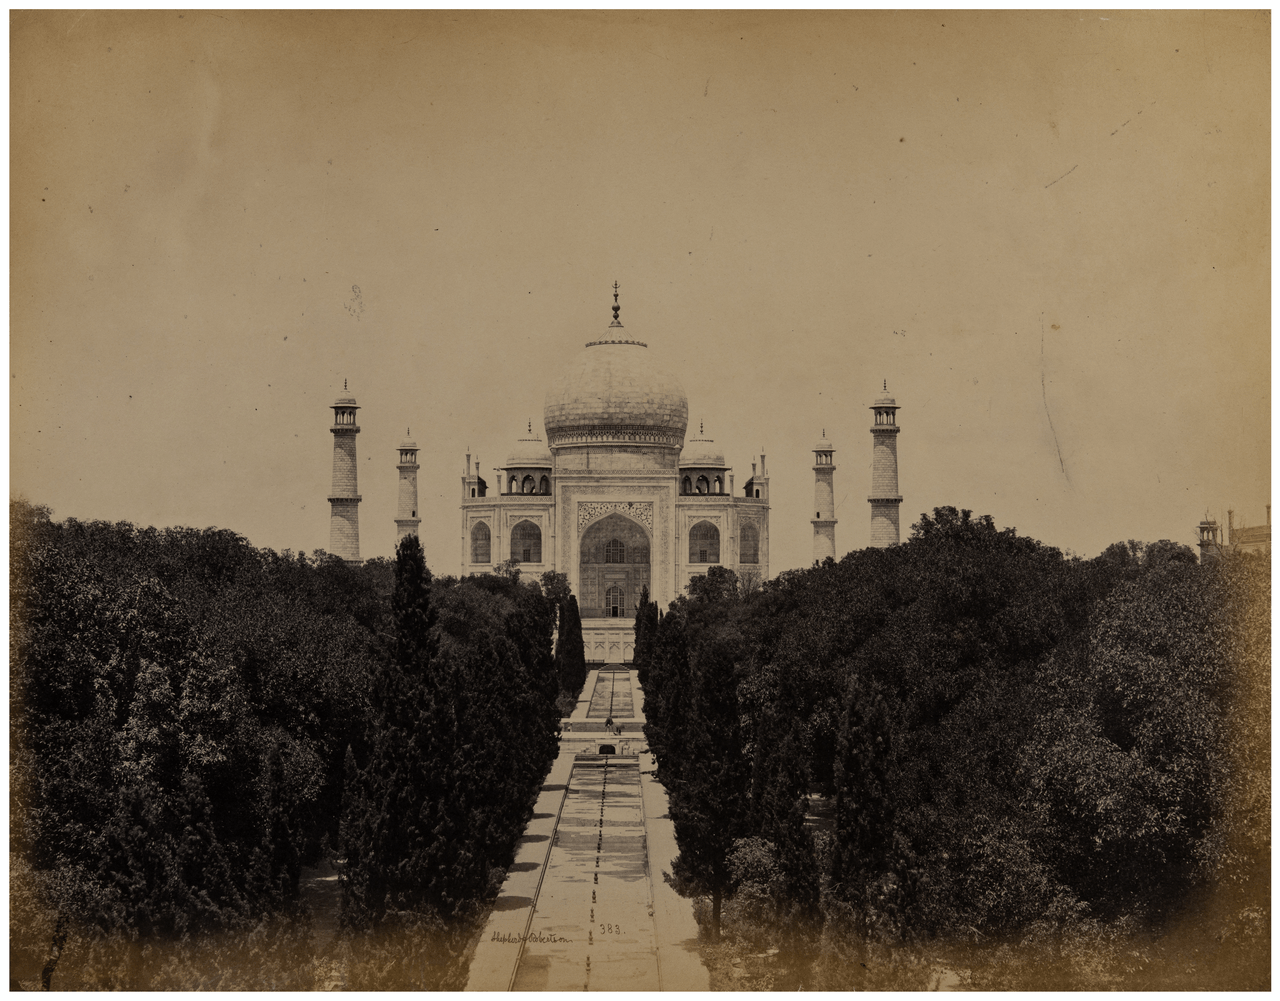 A 19th Century Albumen Photograph Of The Taj Mahal, India By Shepherd & Robertson